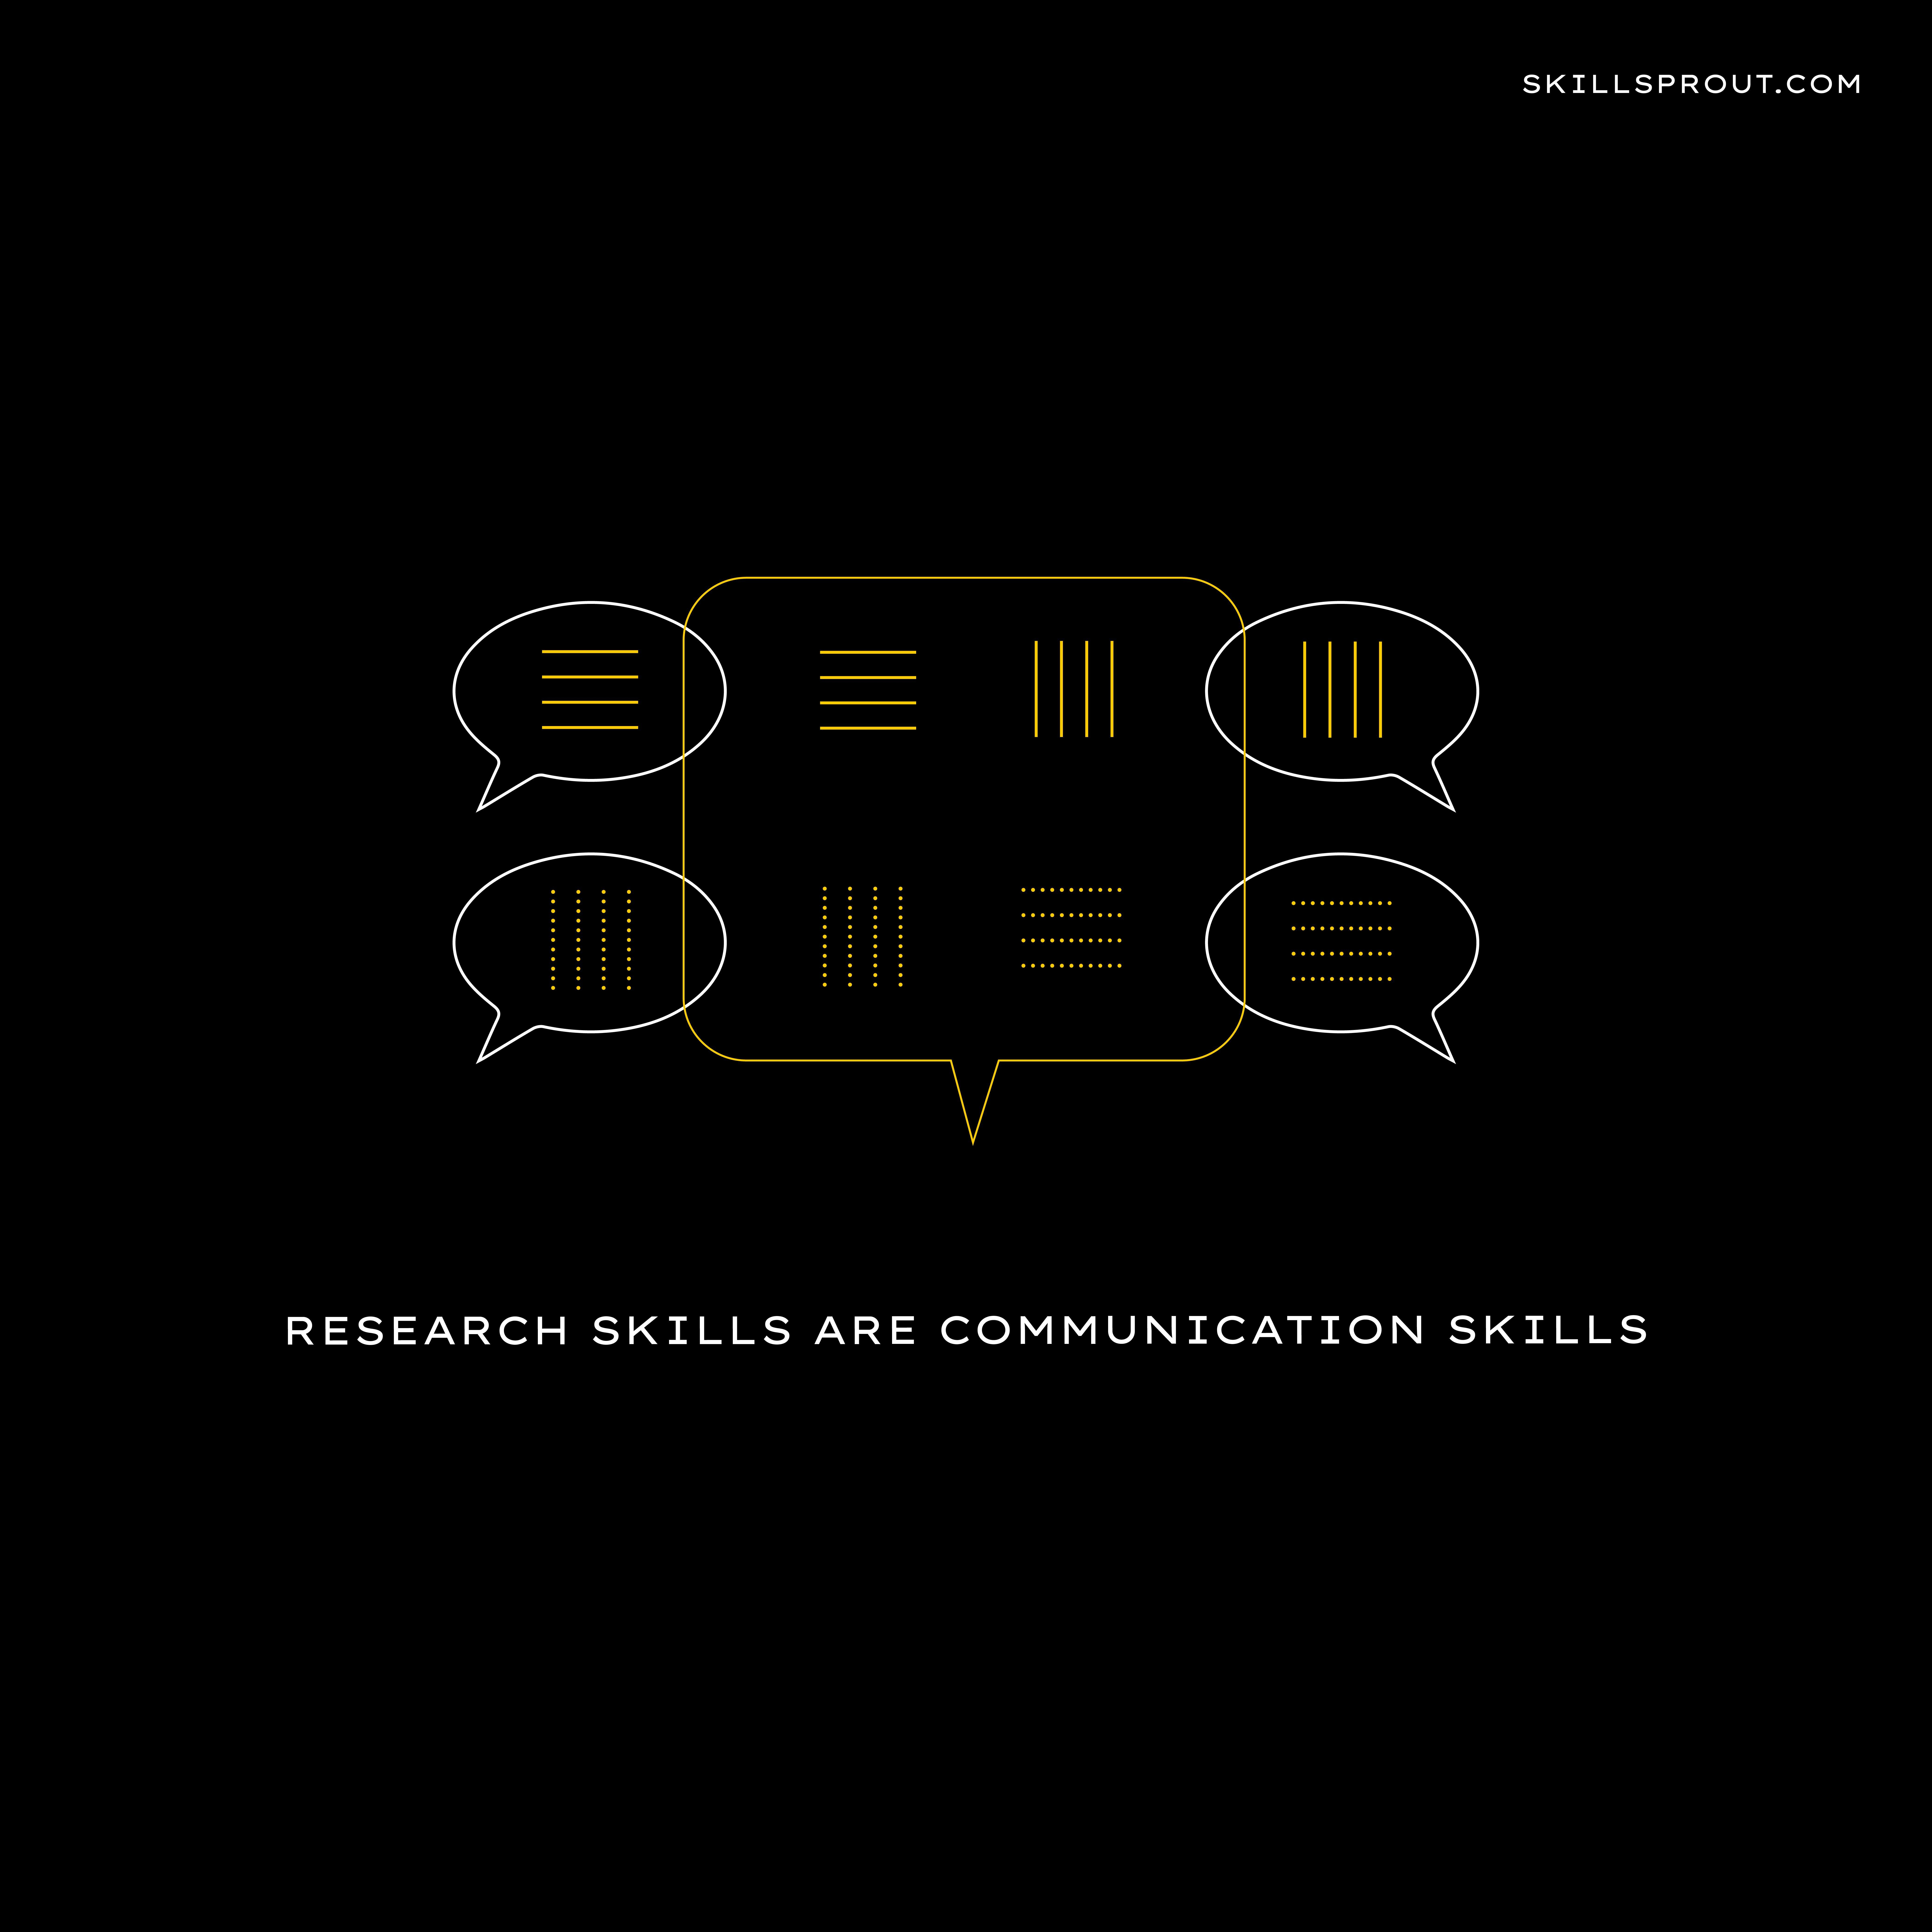 Research skills are communication skills.